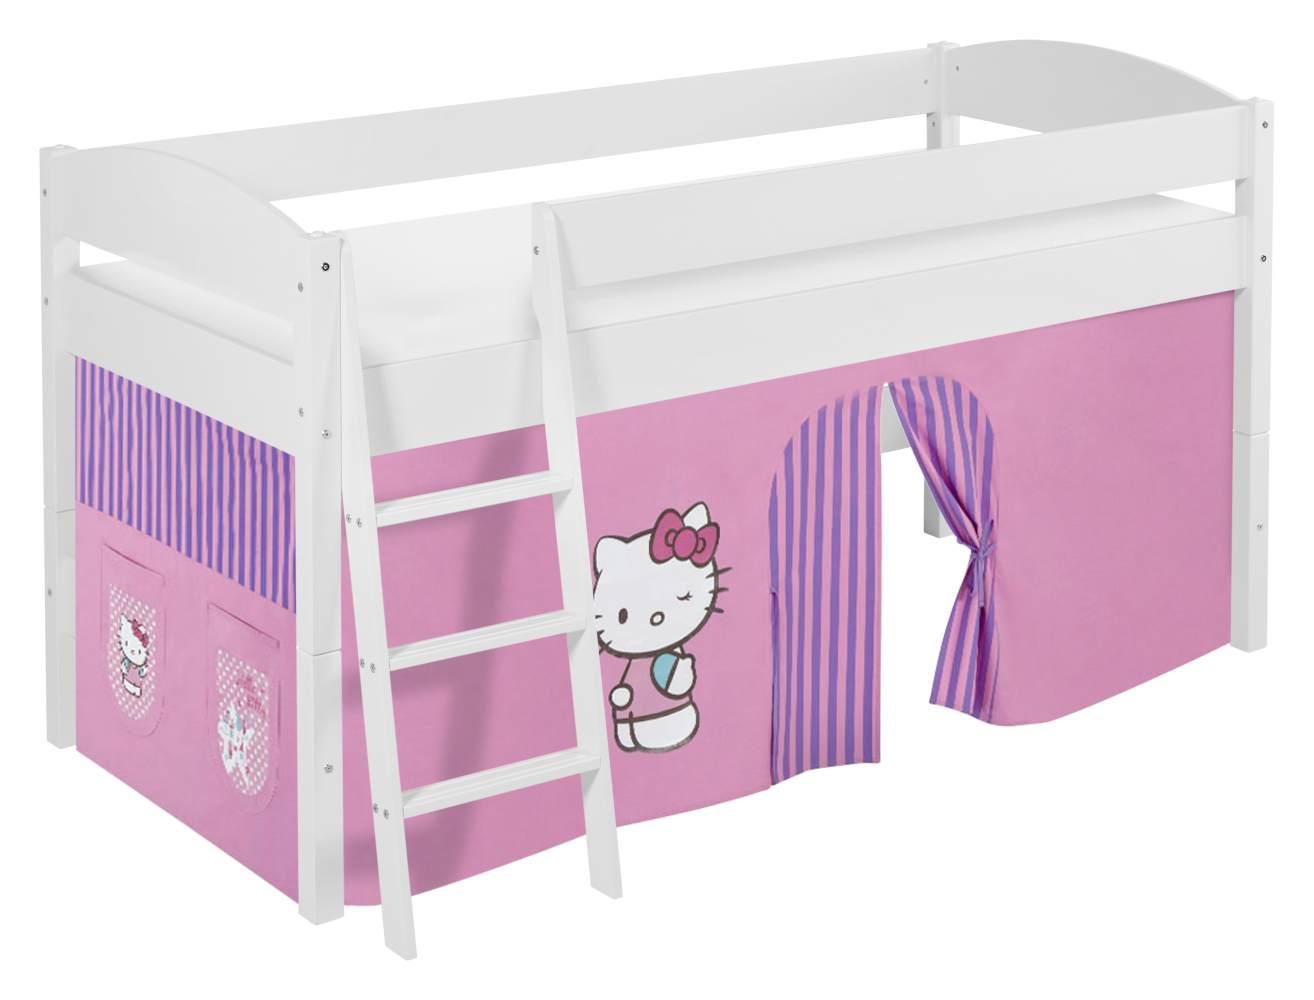 Lilokids 'Ida 4105' Spielbett 90 x 200 cm, Hello Kitty Lila, Kiefer massiv, mit Vorhang Bild 1